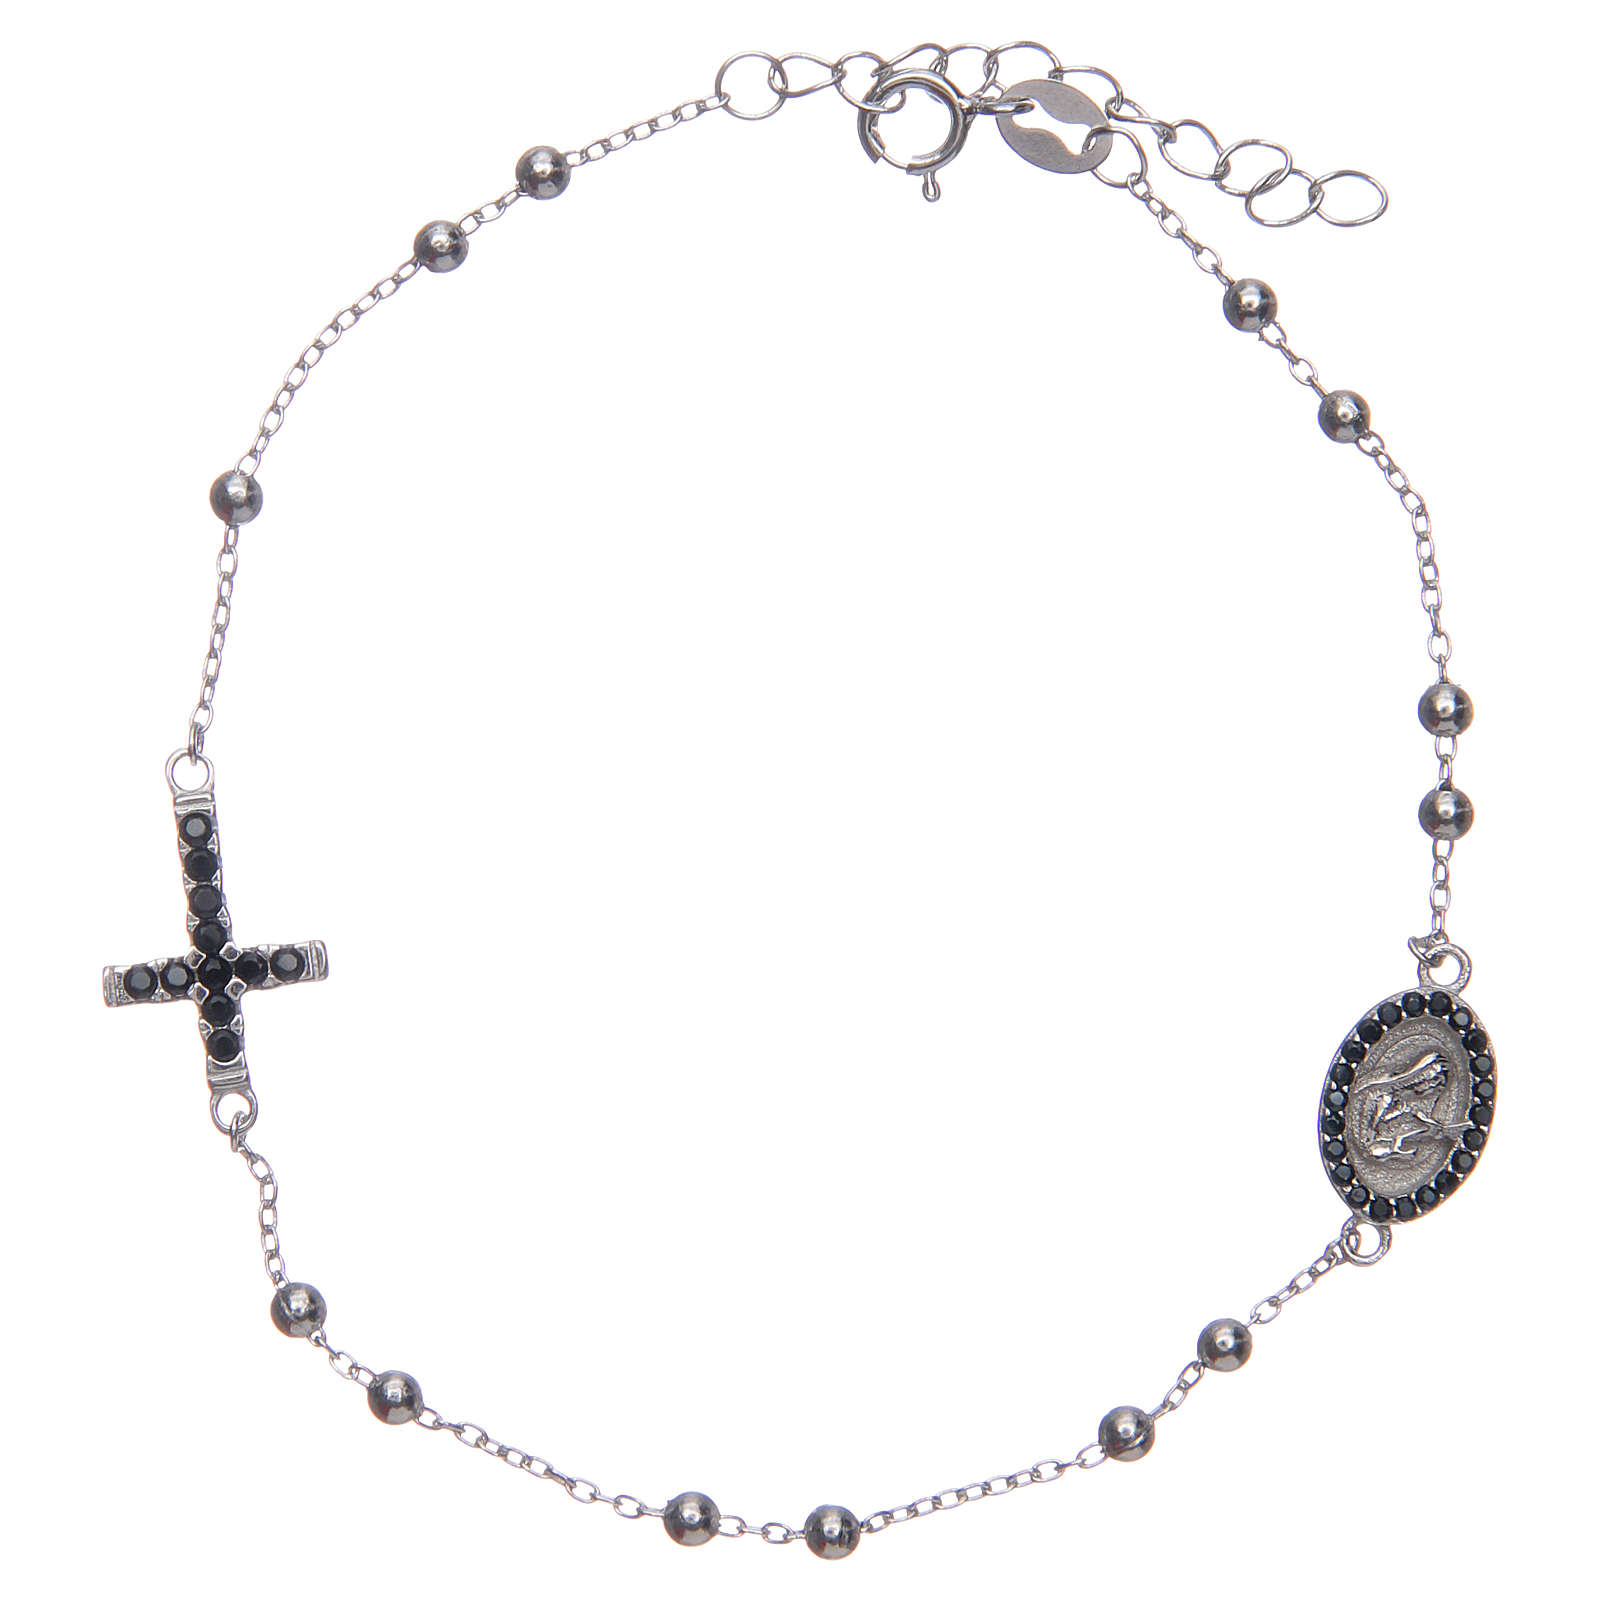 Braccialetto decina Santa Rita silver zirconi neri argento 925 4